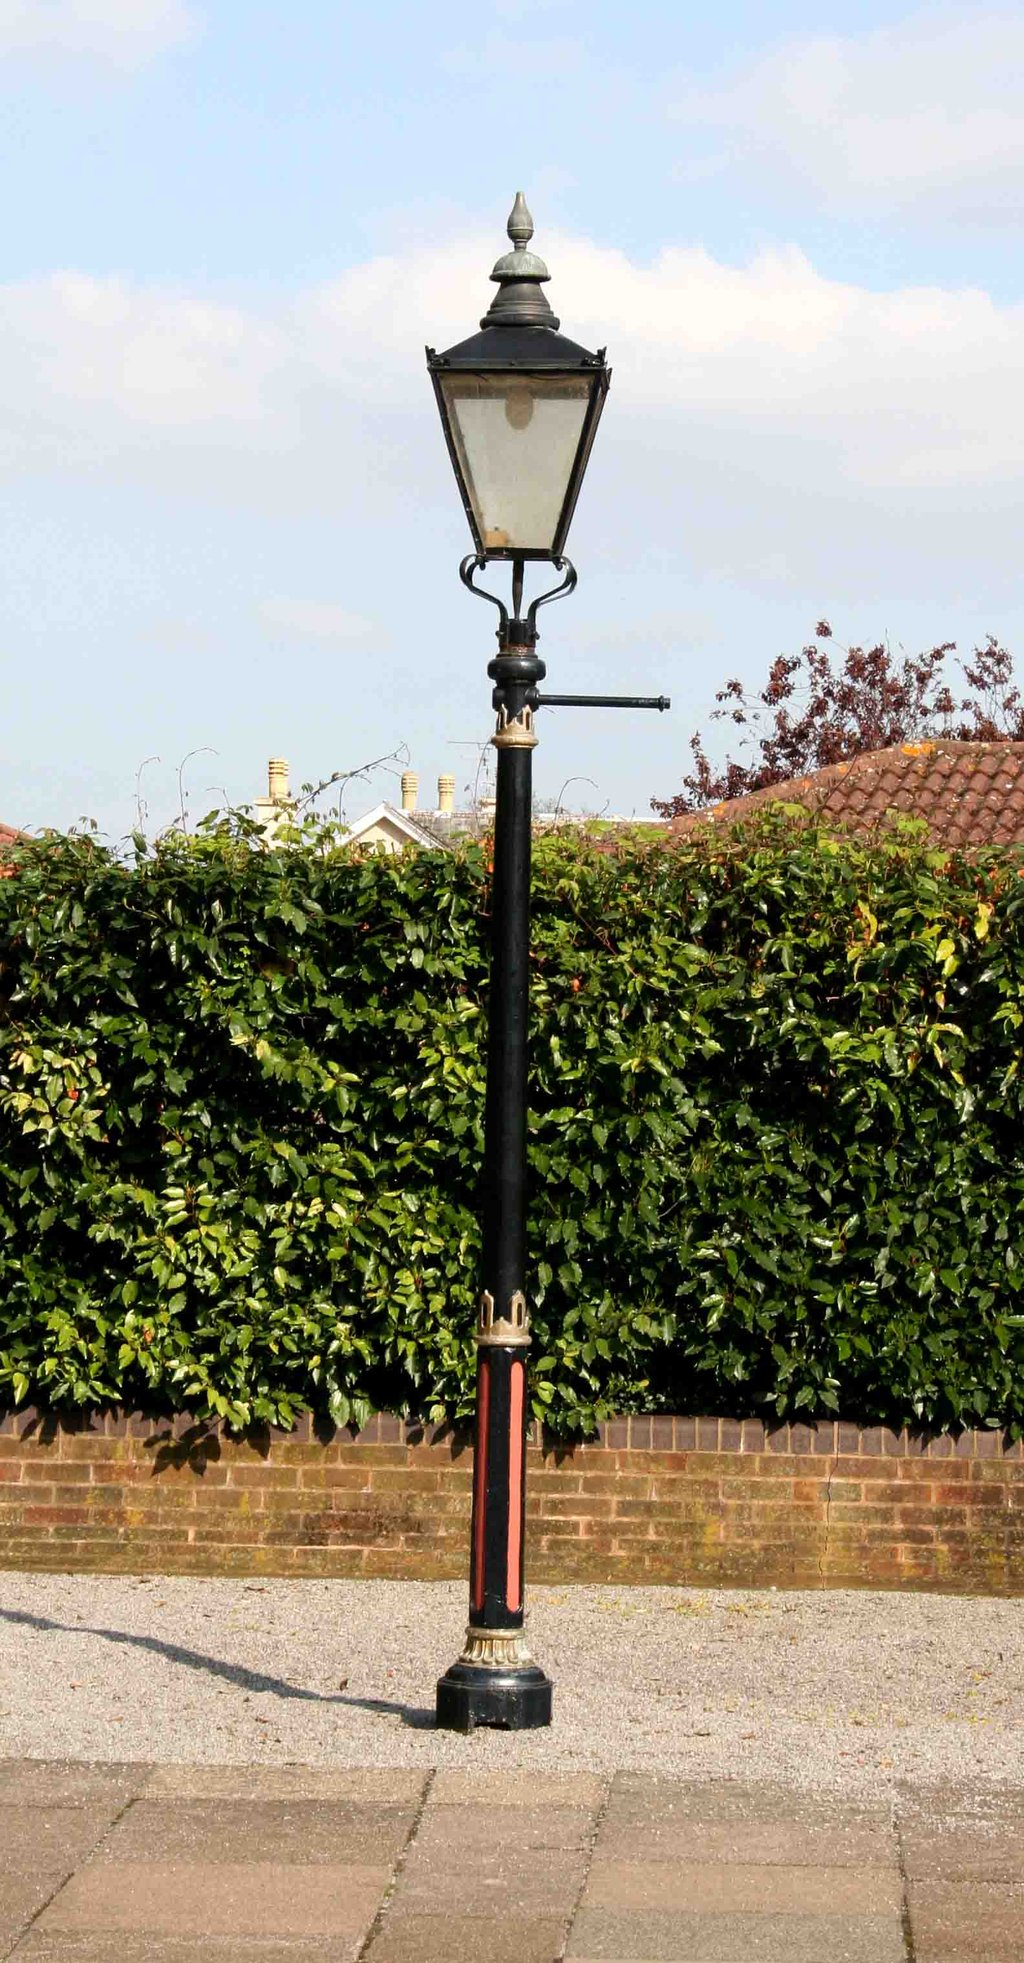 Victorian Street Lamp Warisan Lighting